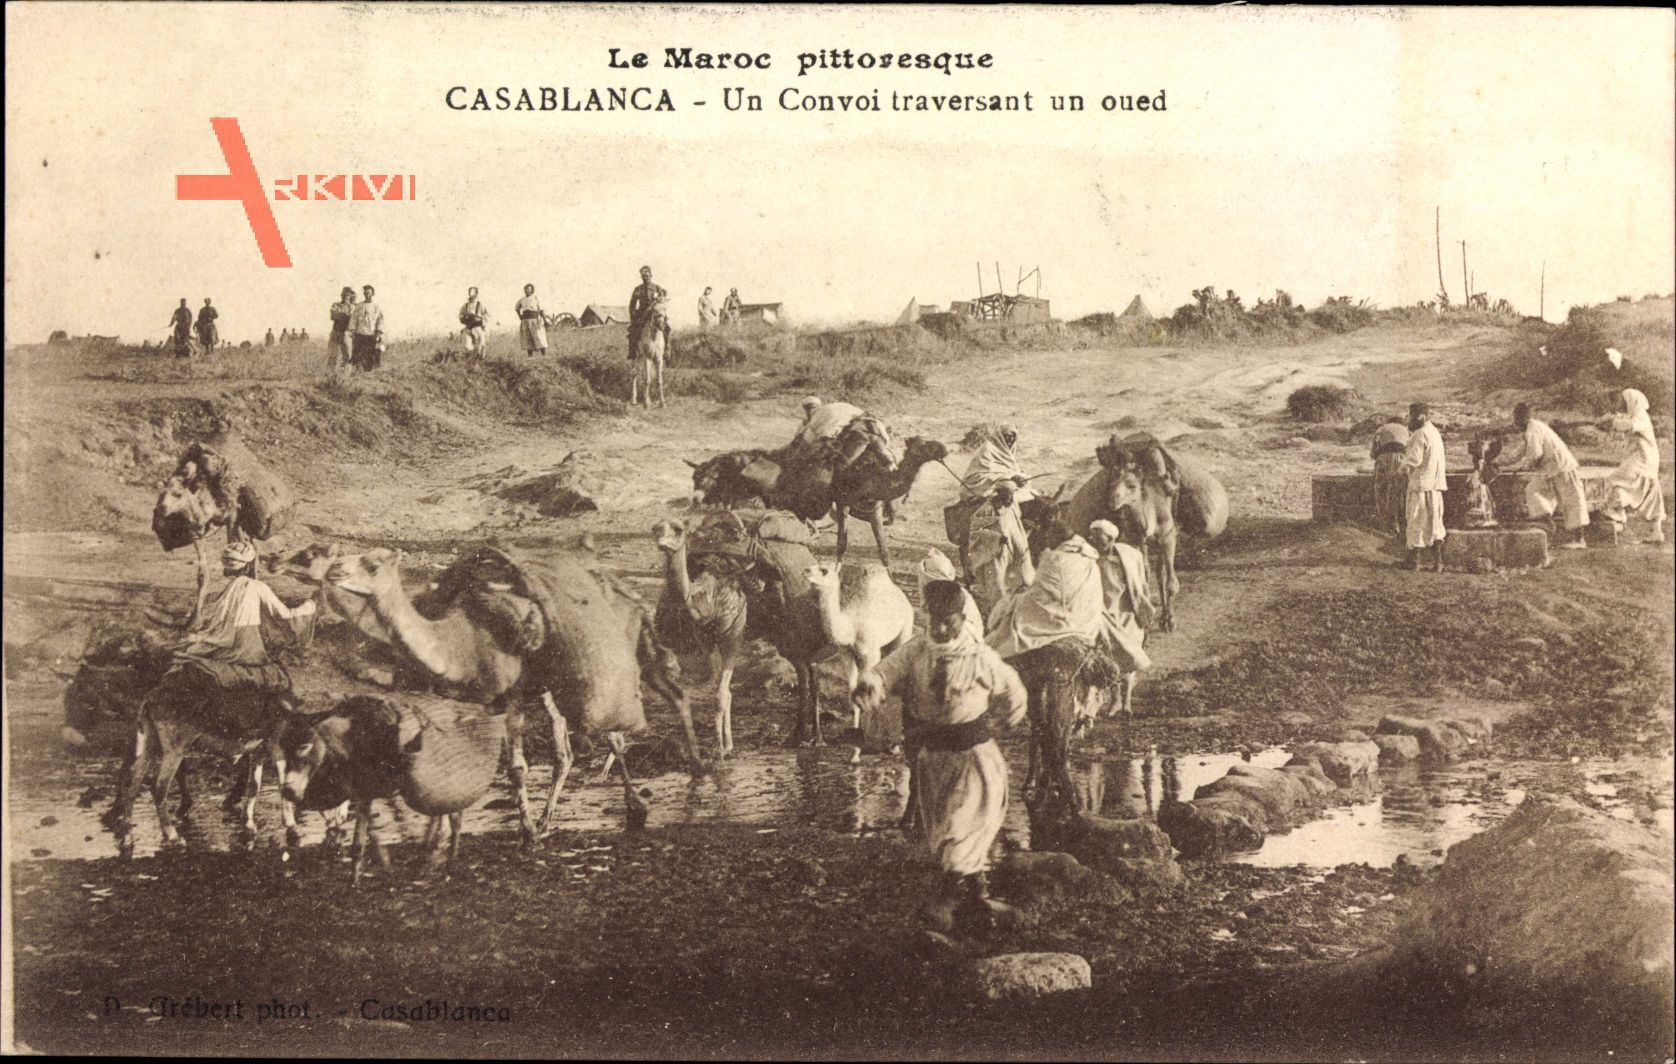 Casablanca Marokko, Un Convoi traversant un oued, Konvoi, Kamele